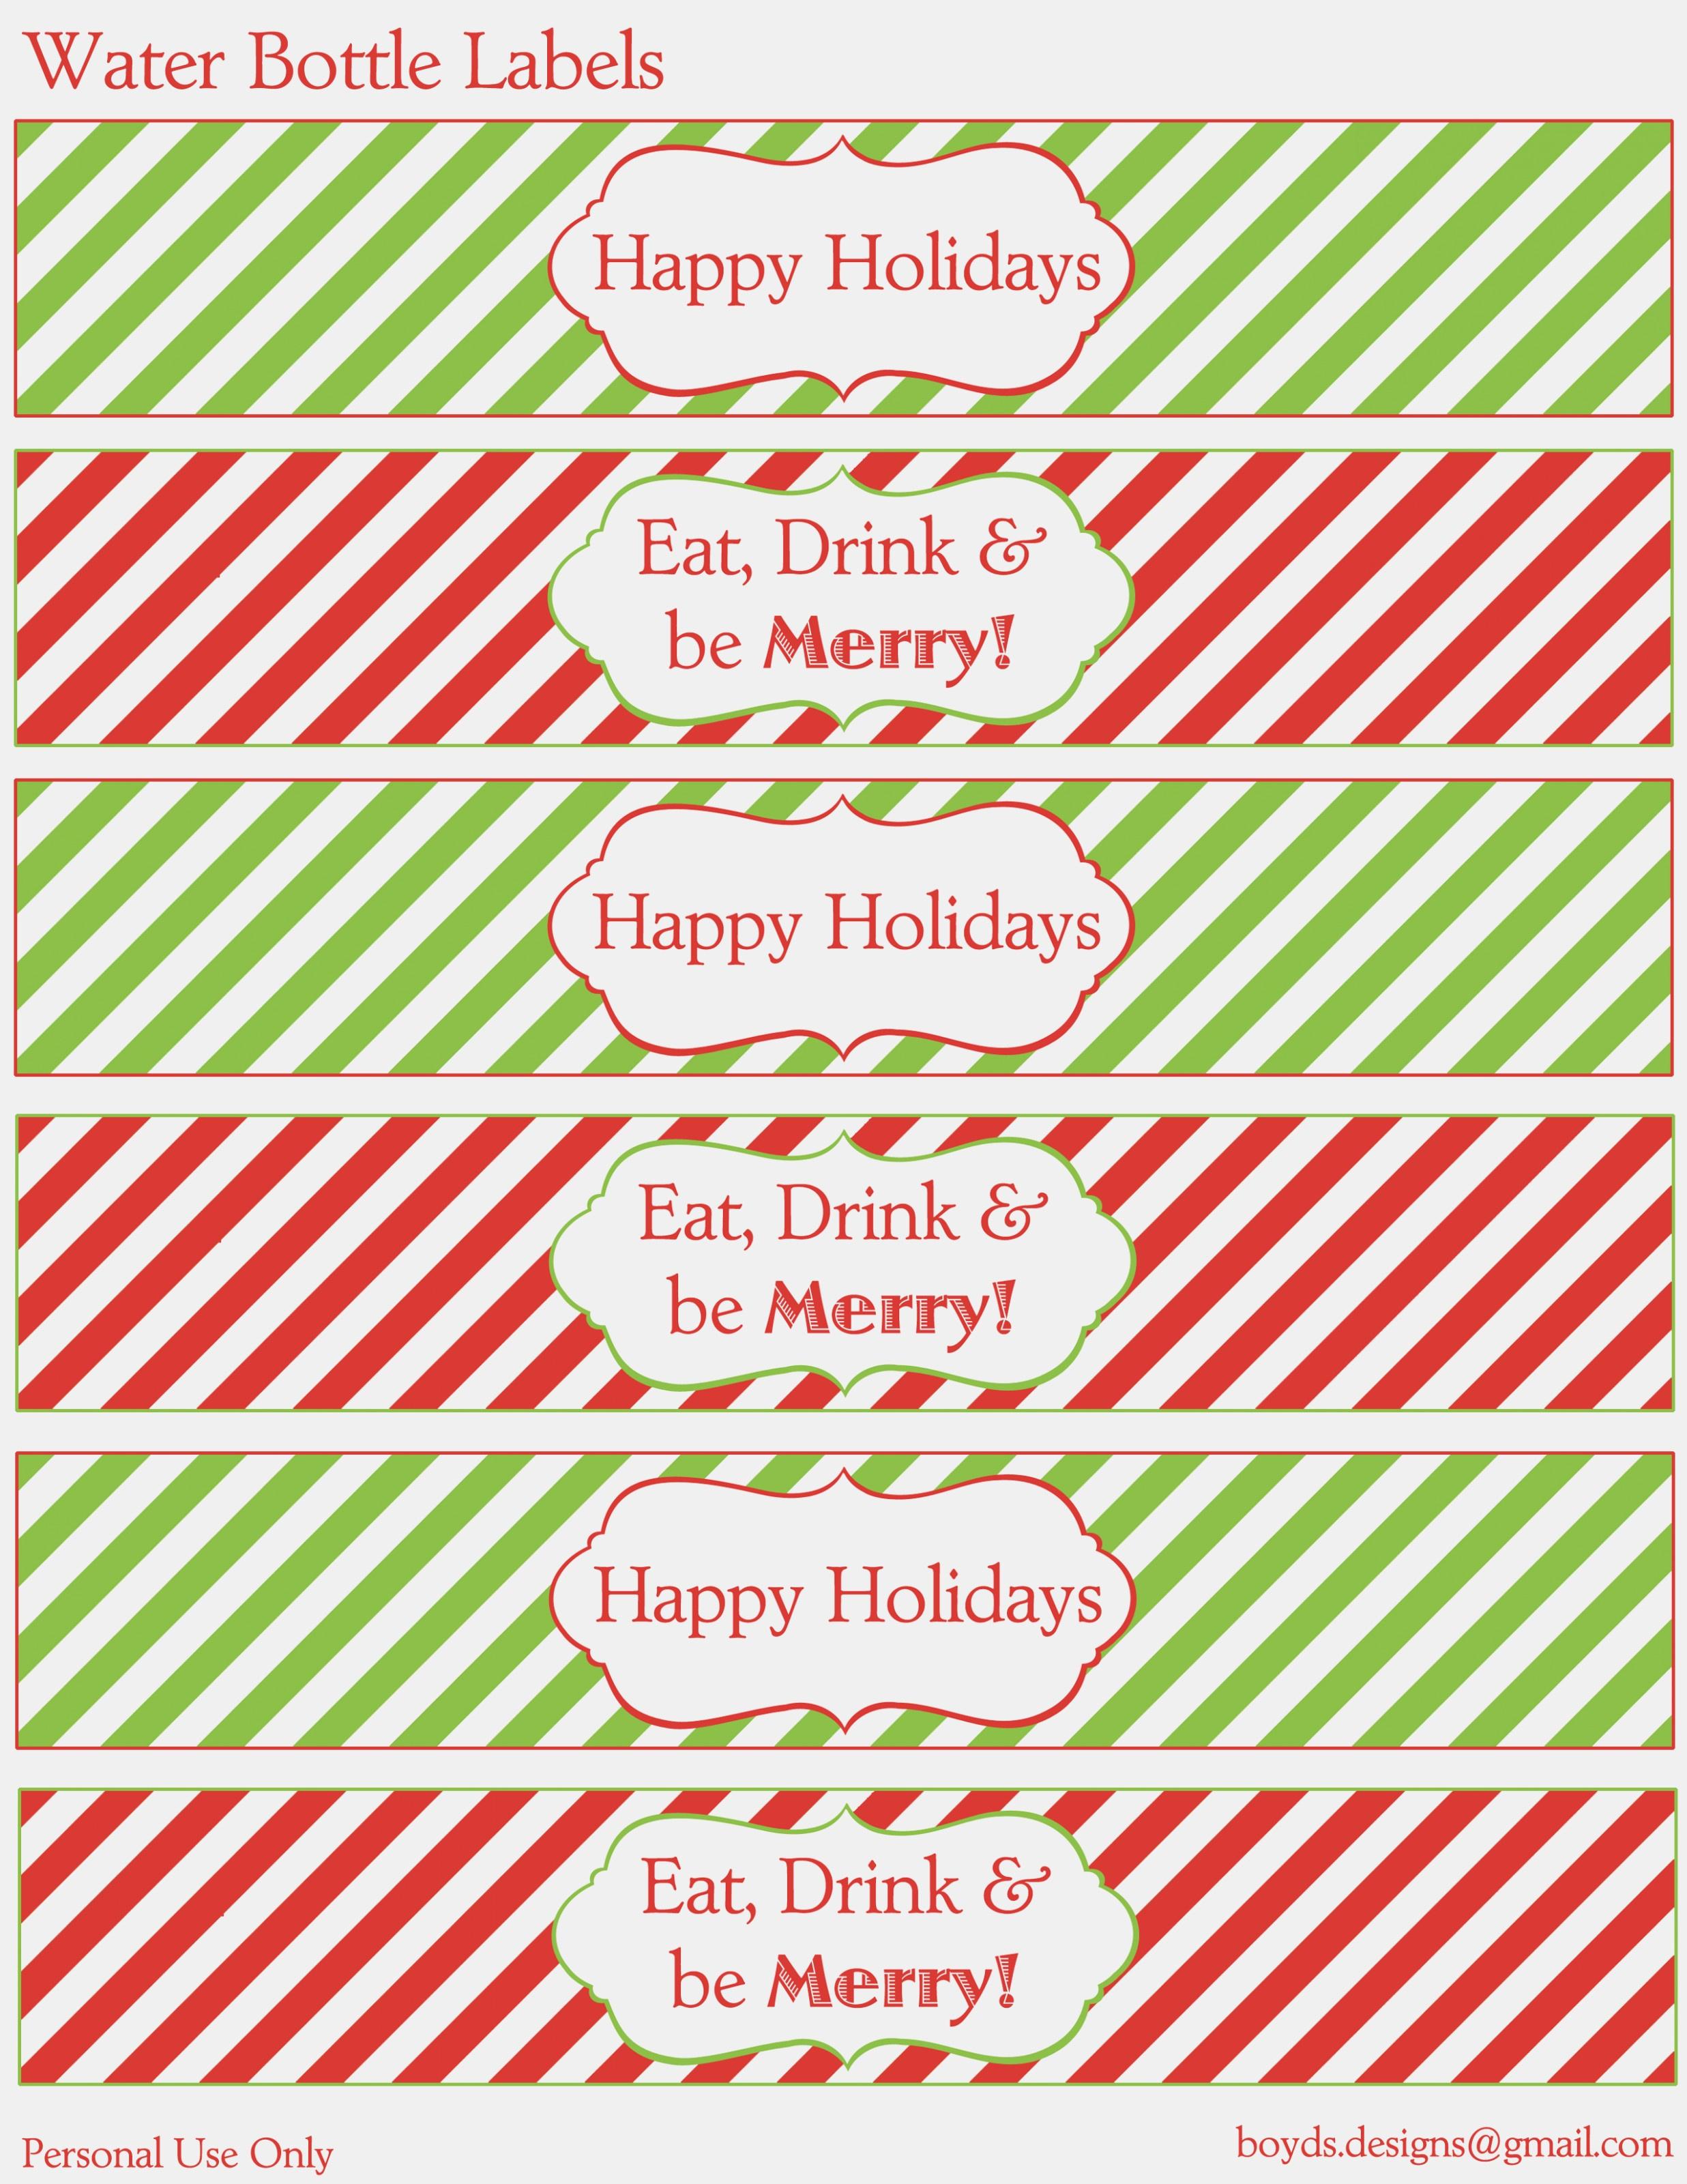 Water Bottle Printables For Christmas – Christmas Printables – Print - Christmas Water Bottle Labels Free Printable